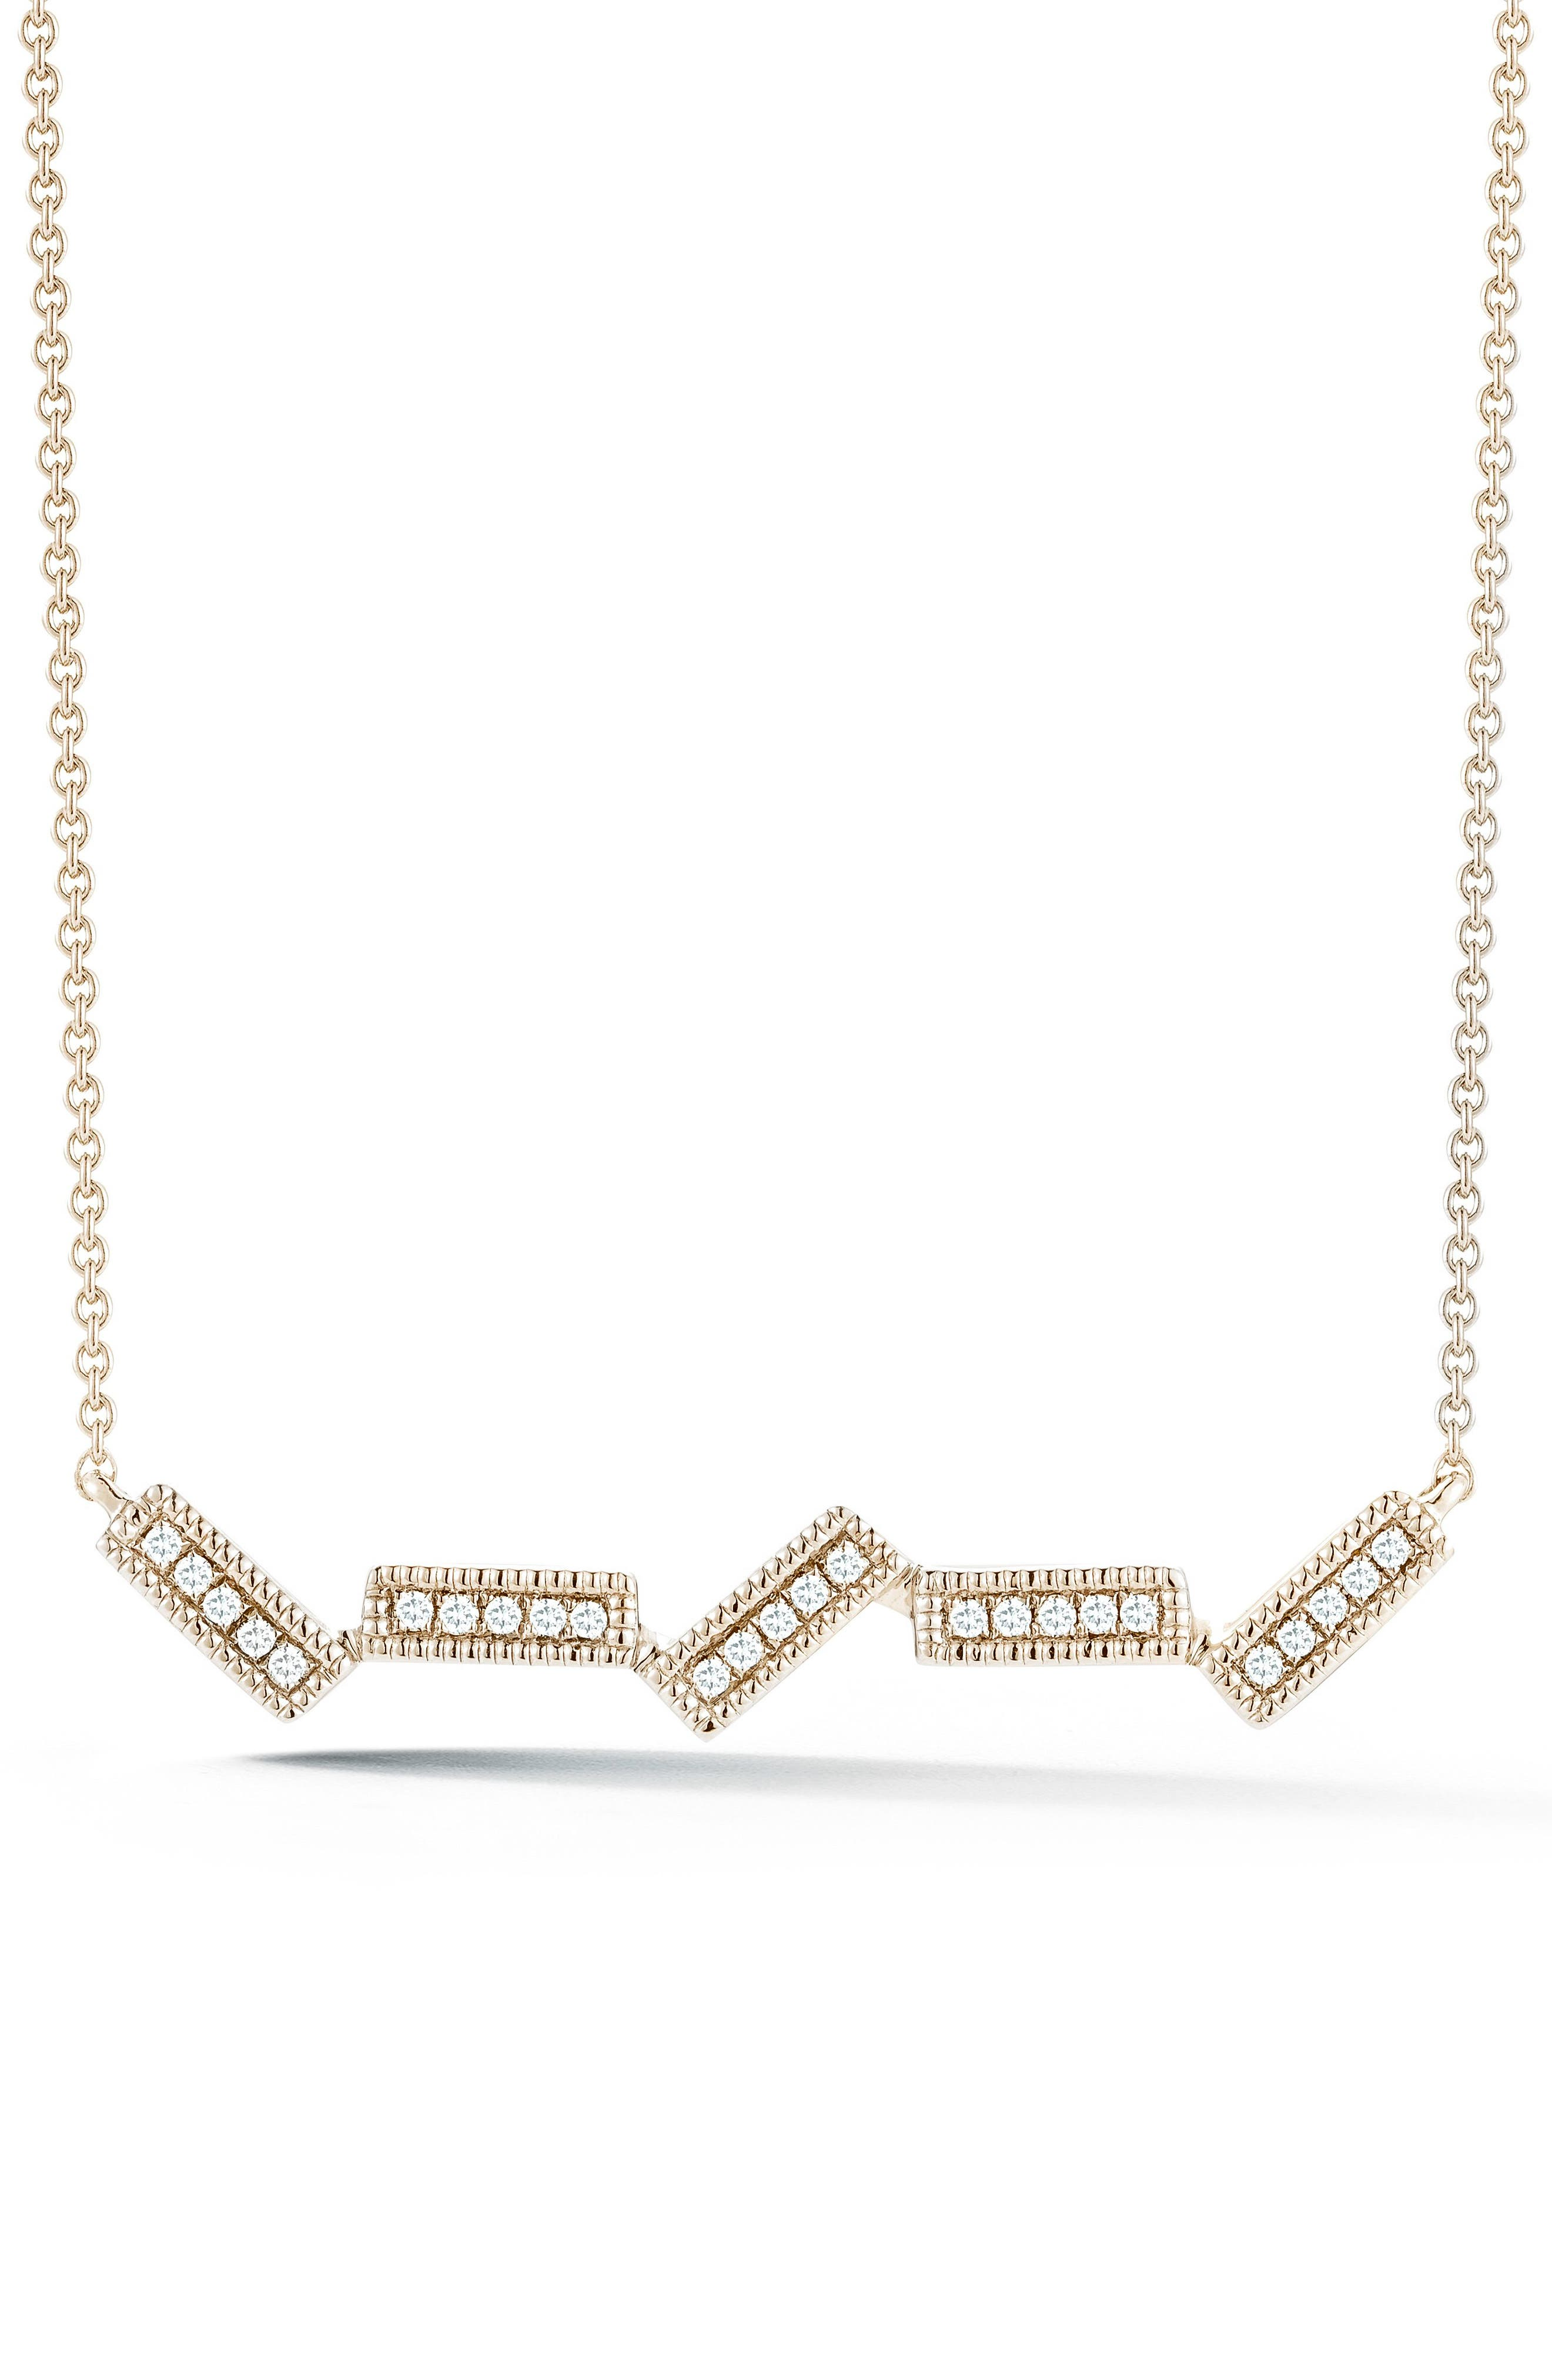 Alternate Image 1 Selected - Dana Rebecca Designs Sylvie Rose Five-Bar Diamond Pendant Necklace